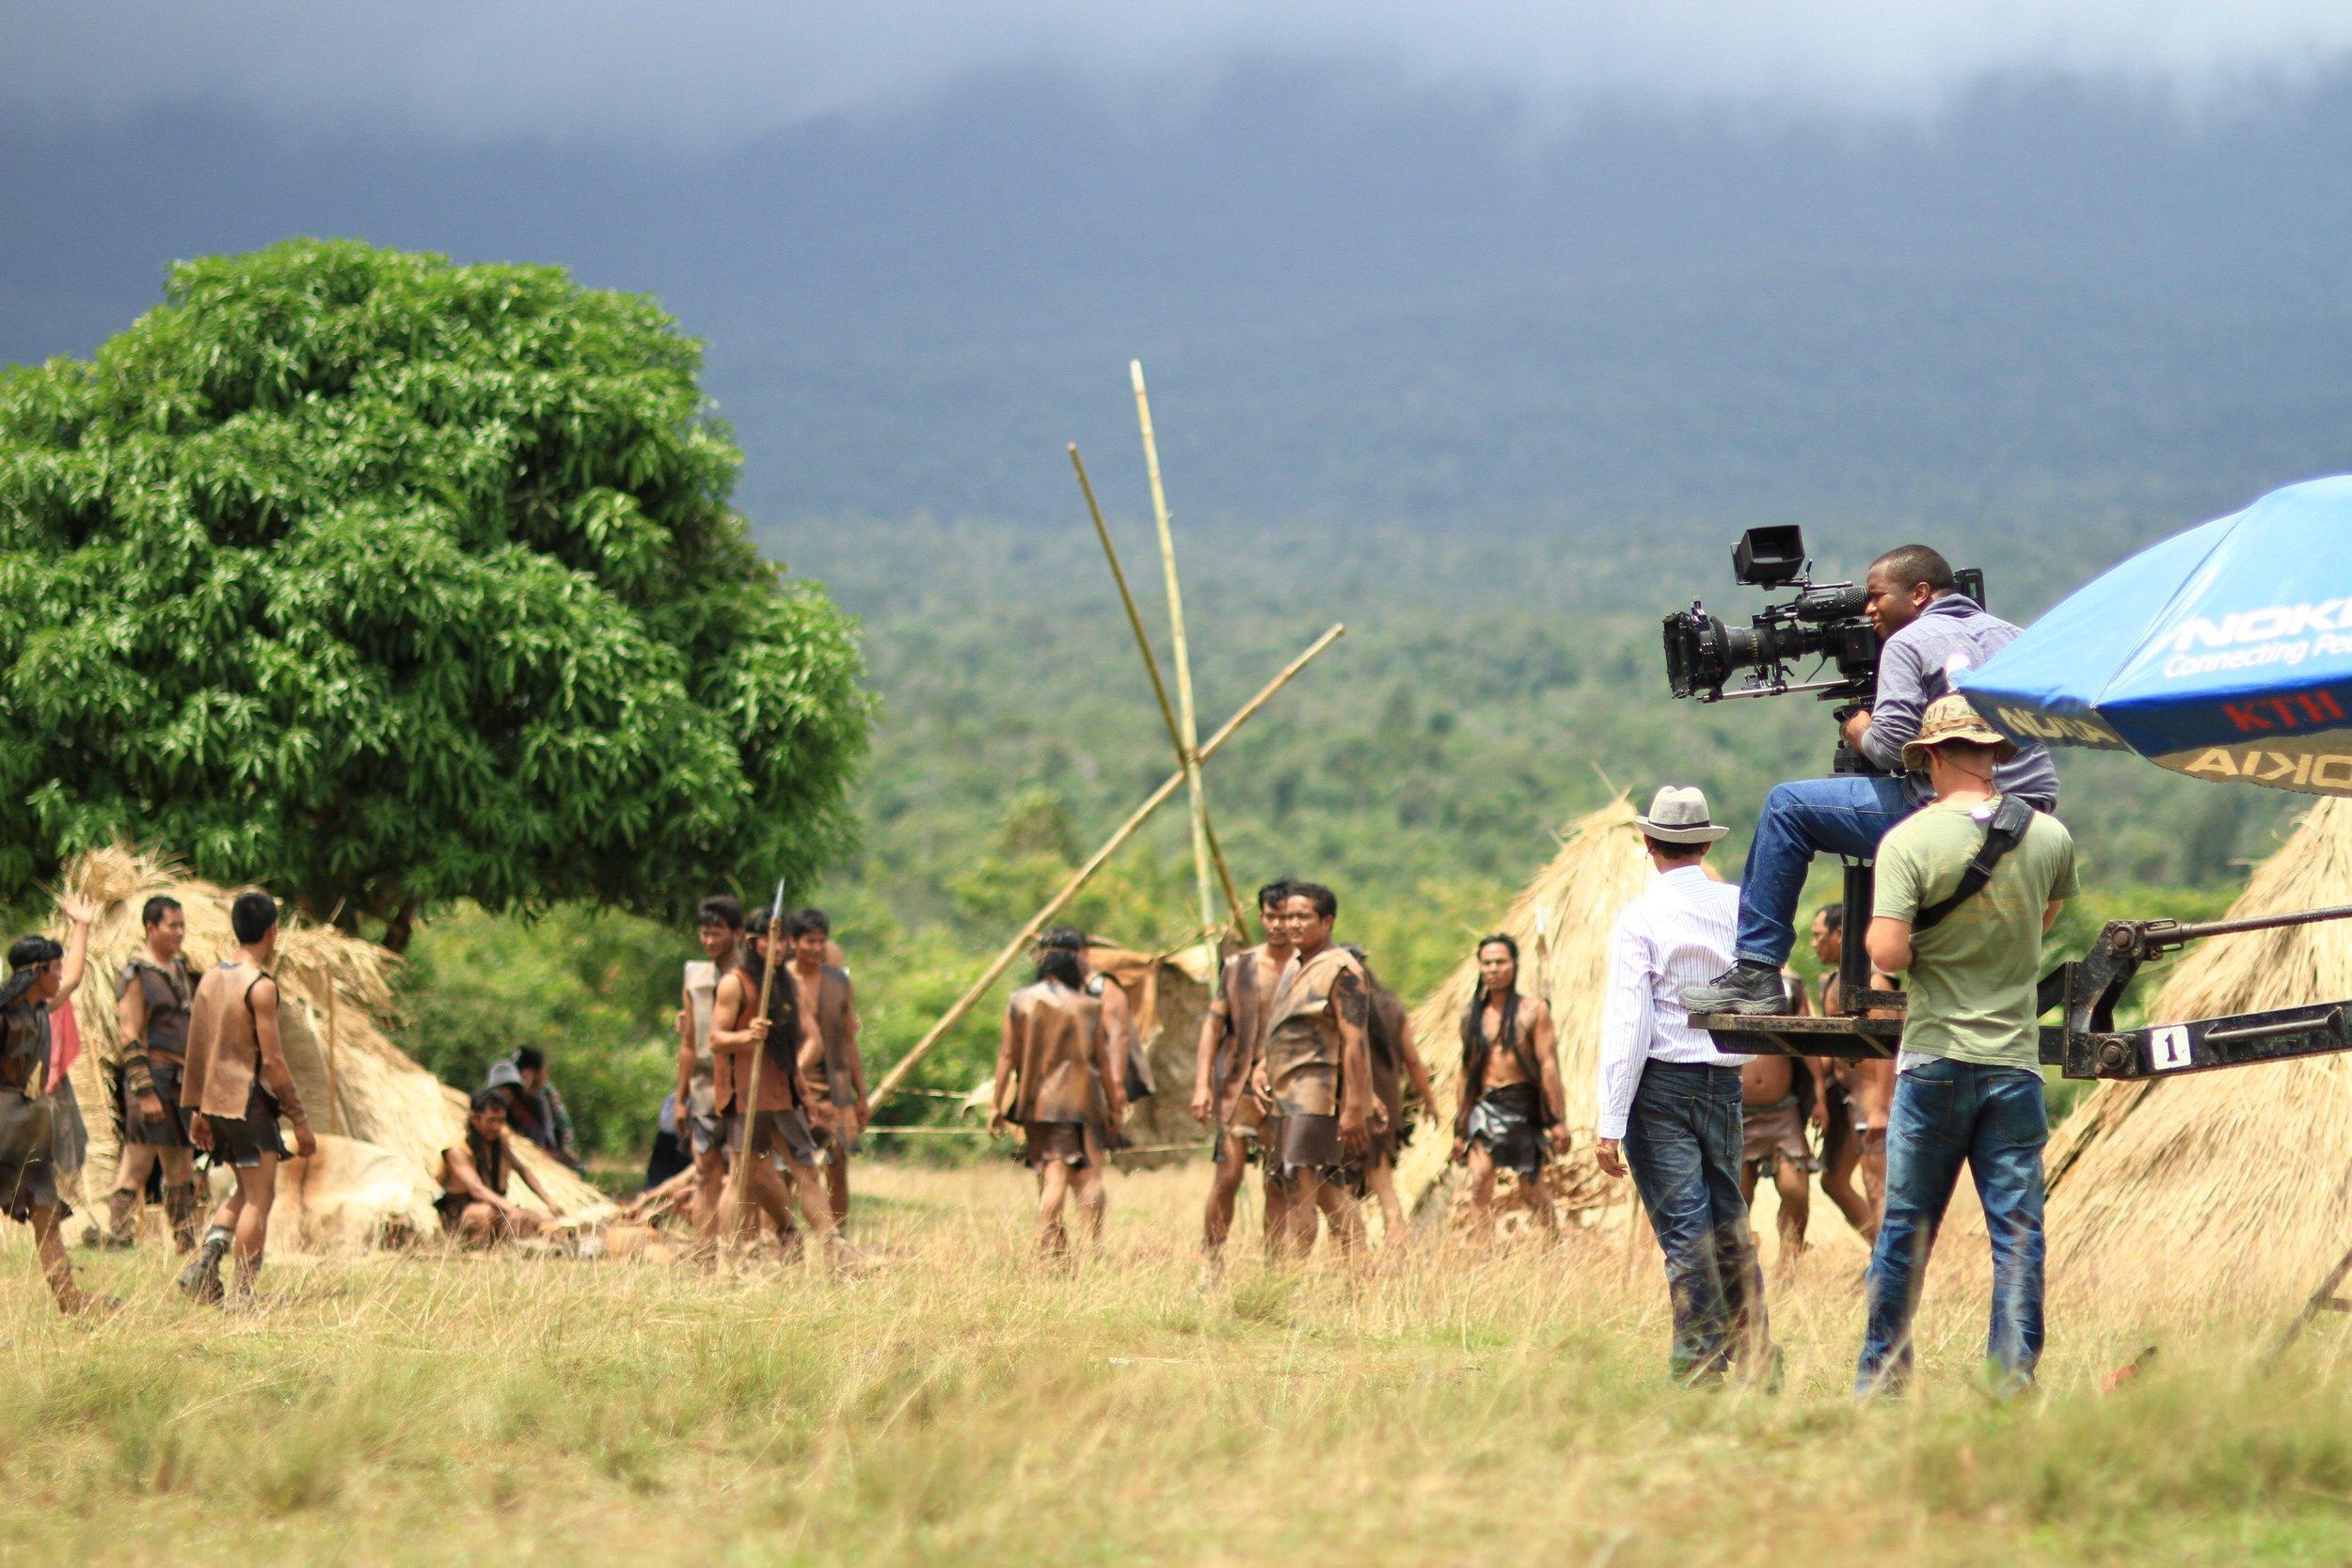 crew-field-filming-275977.jpg